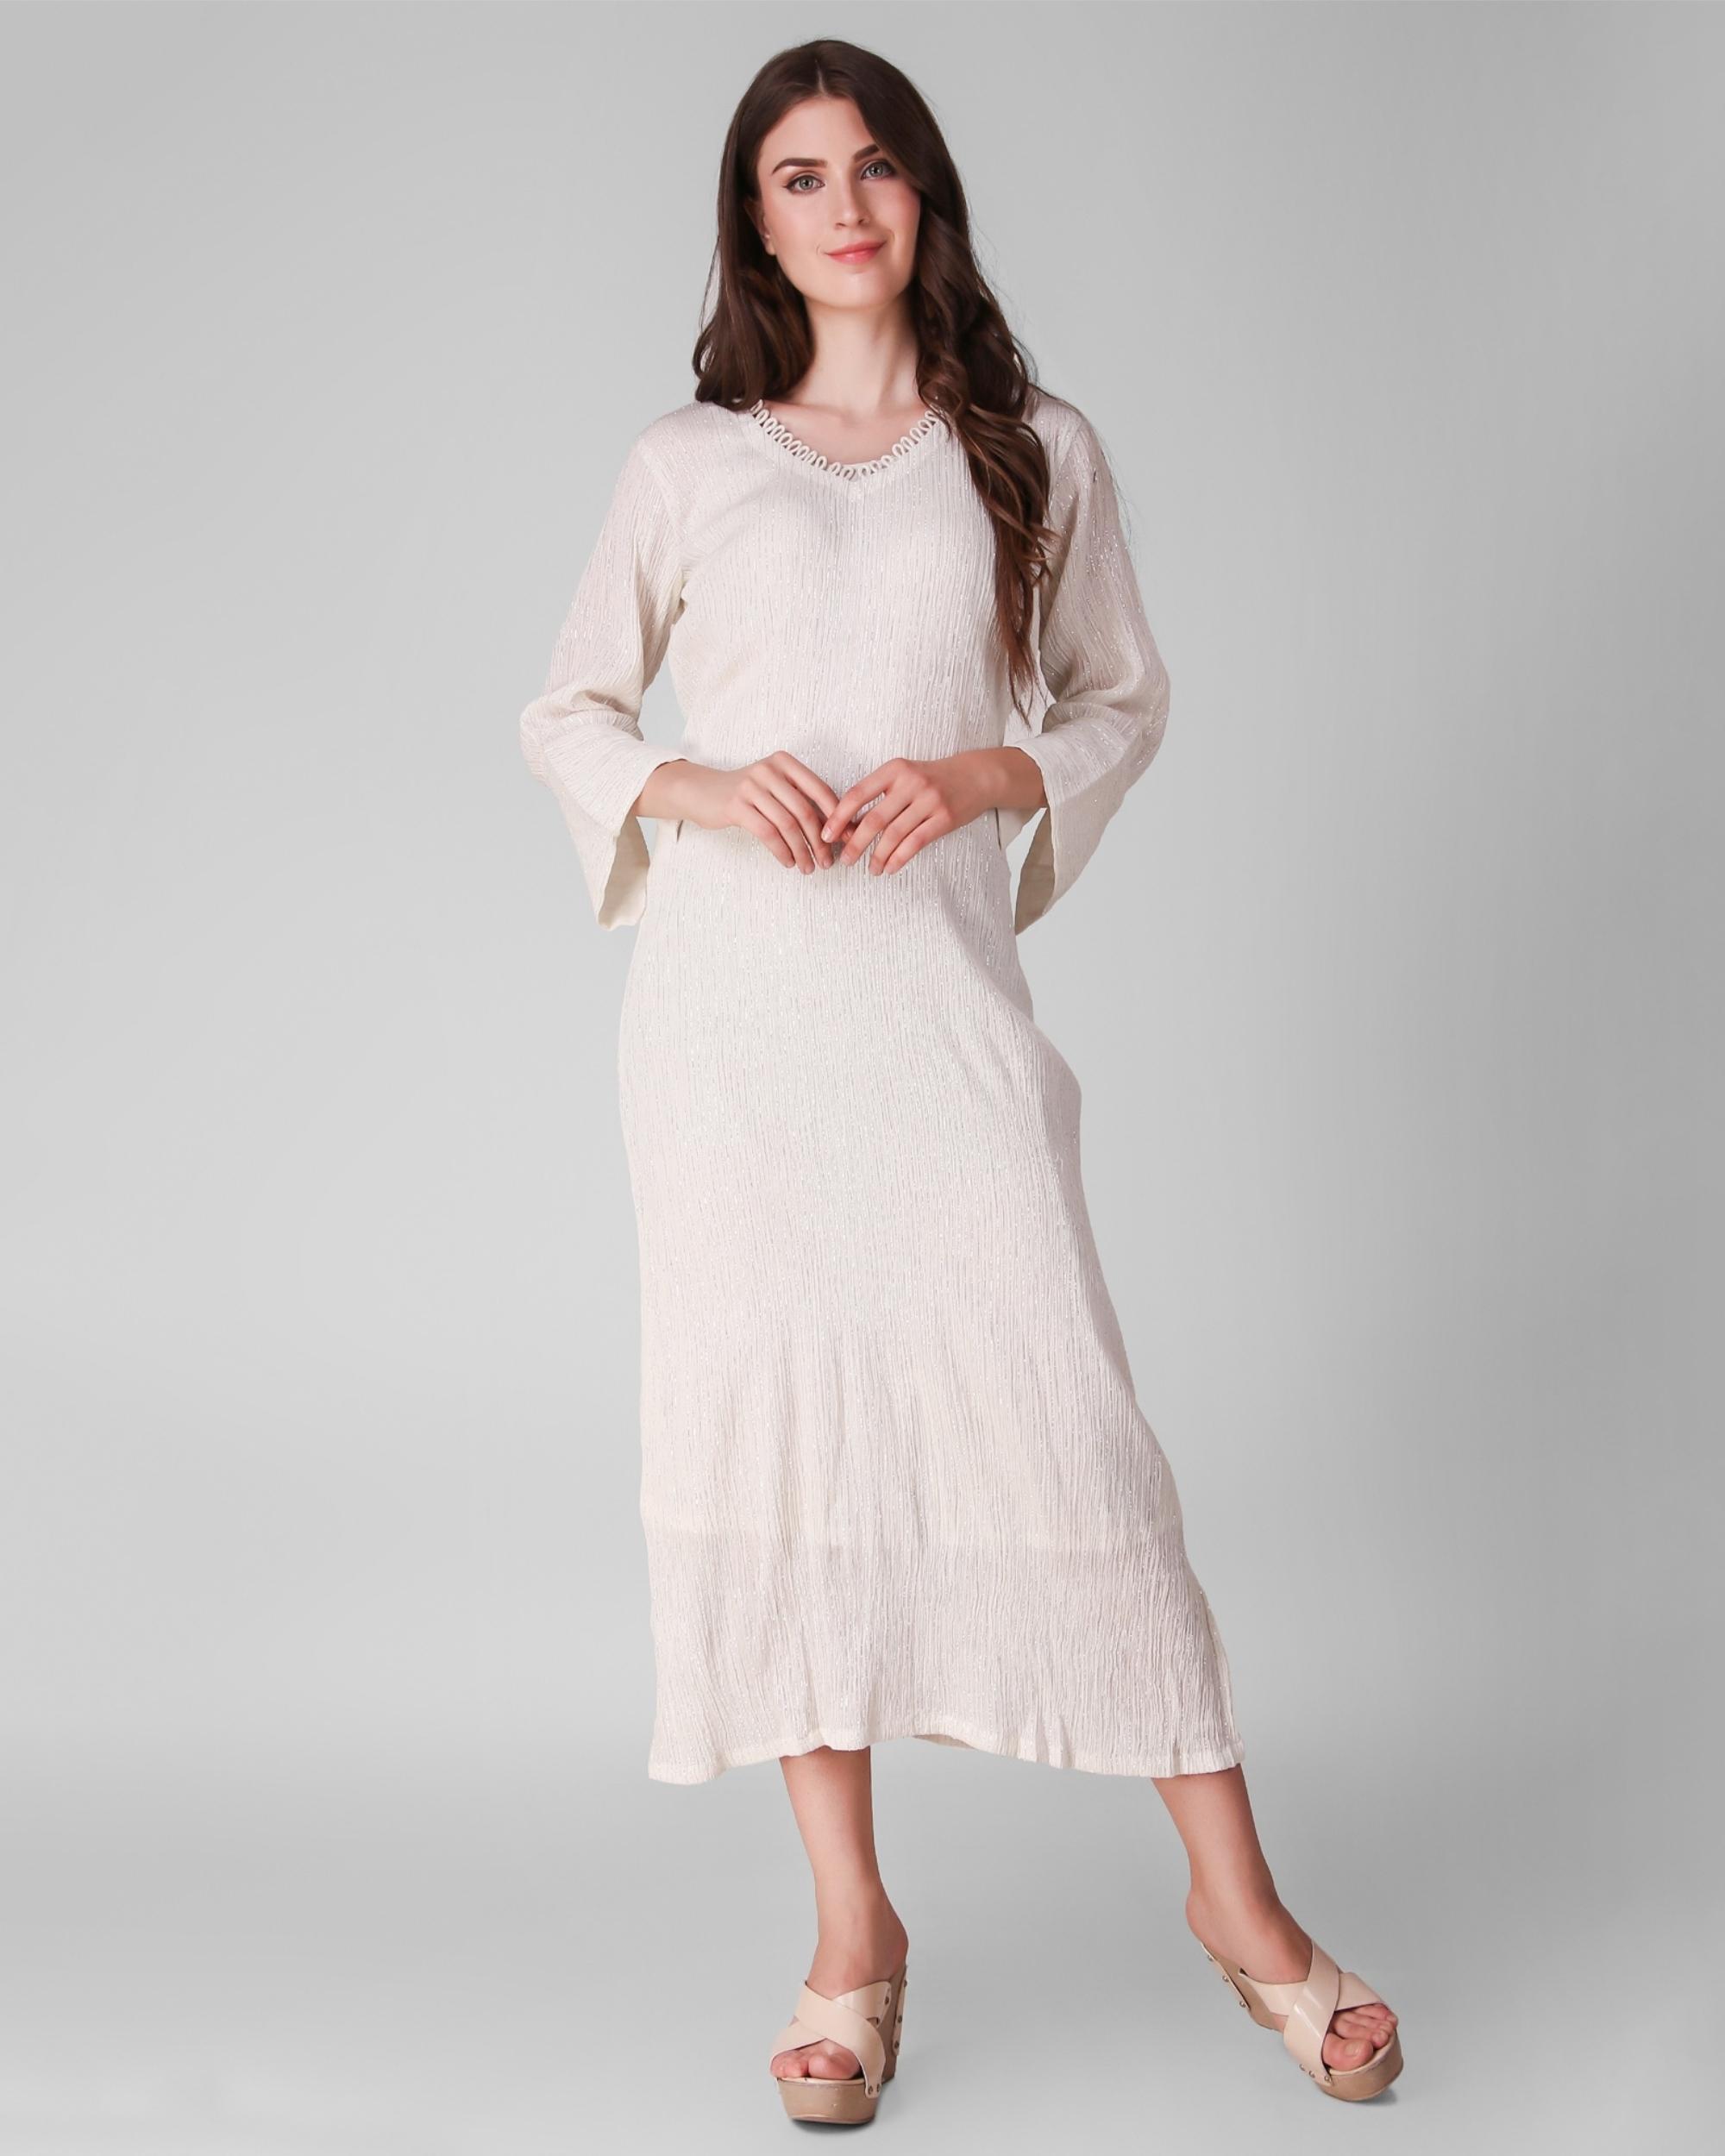 Ivory cotton crepe lurex dress - set of two